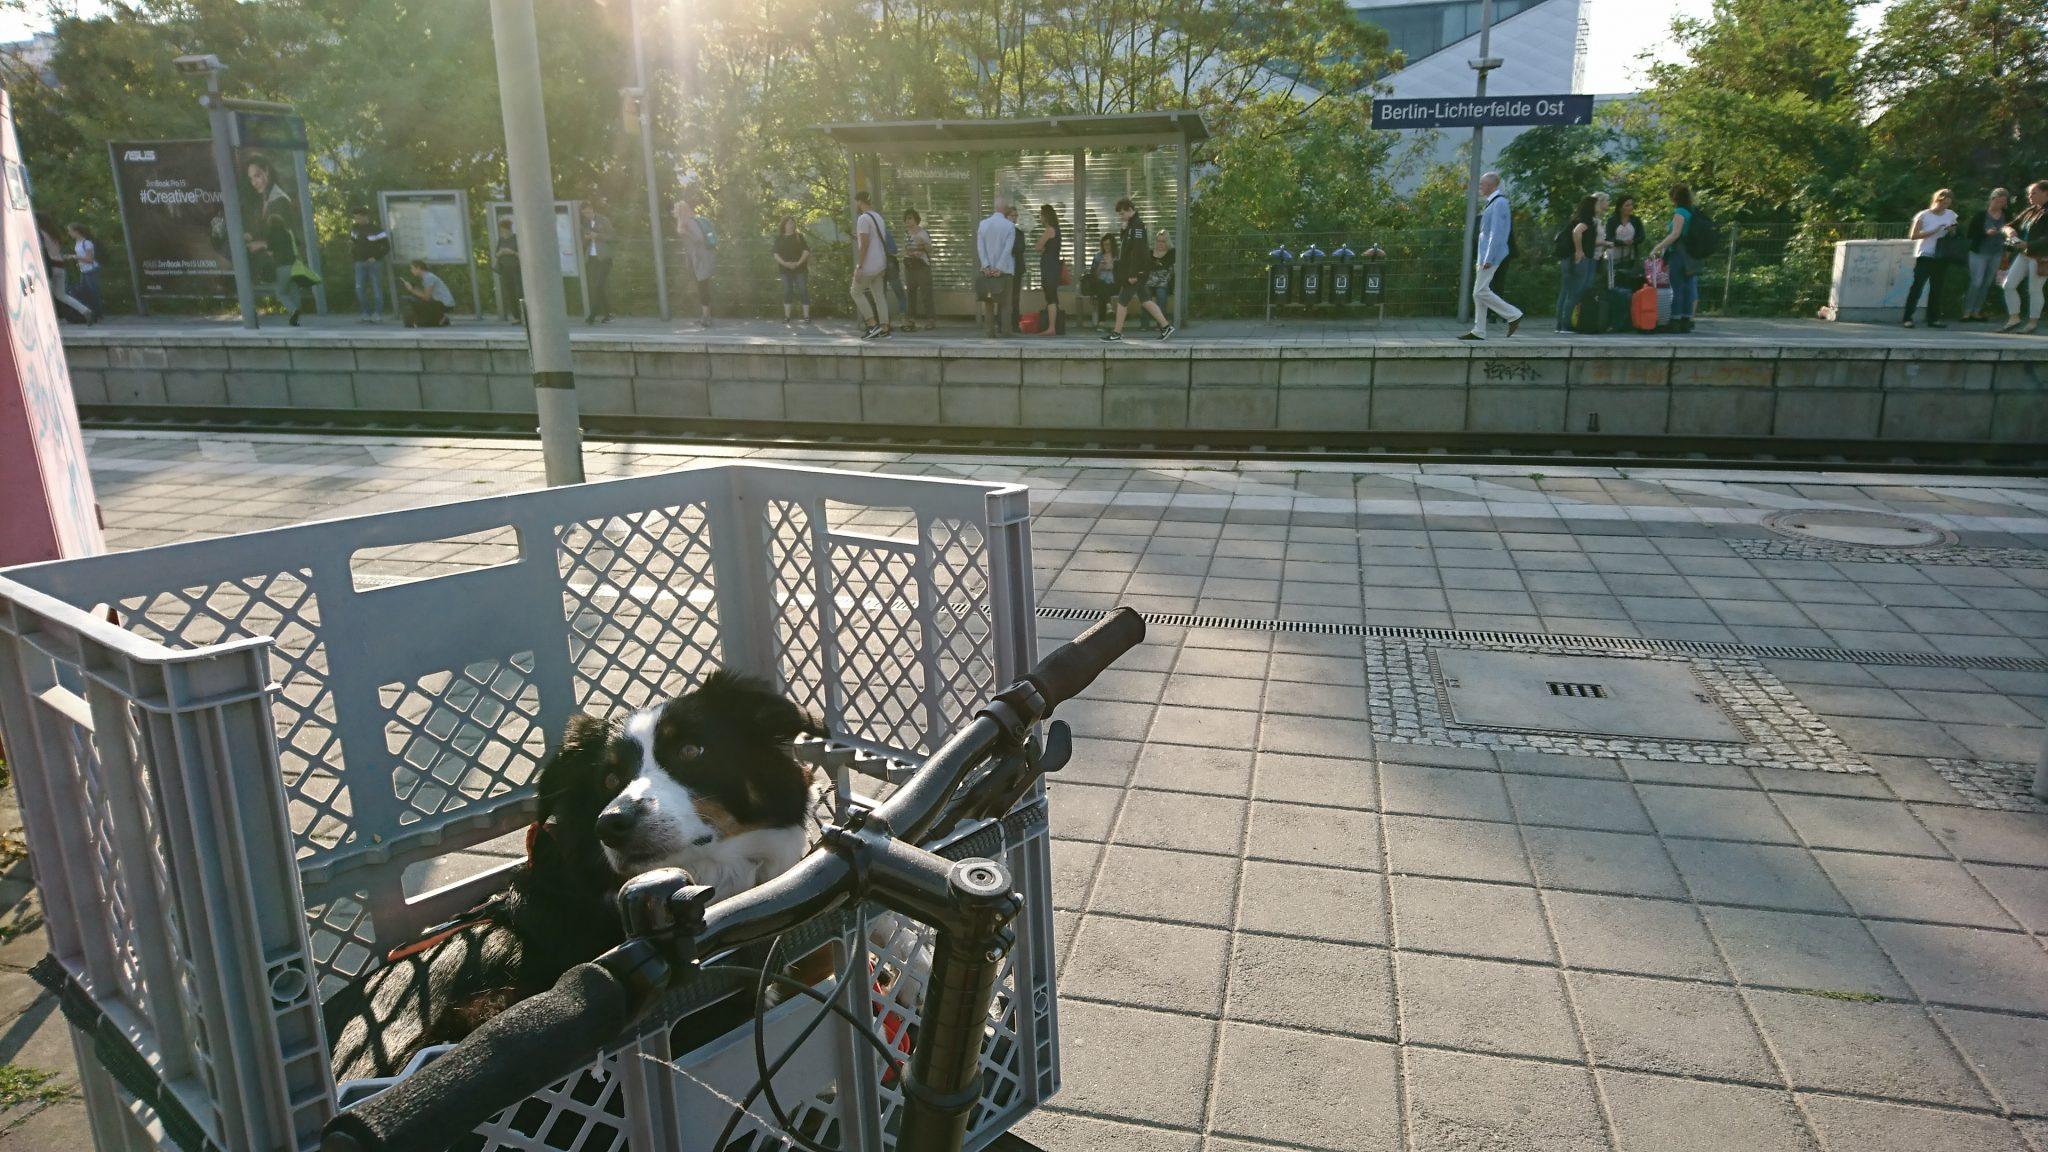 Fahrradtour Flaeming Skate Start In Berlin am Bahnhof